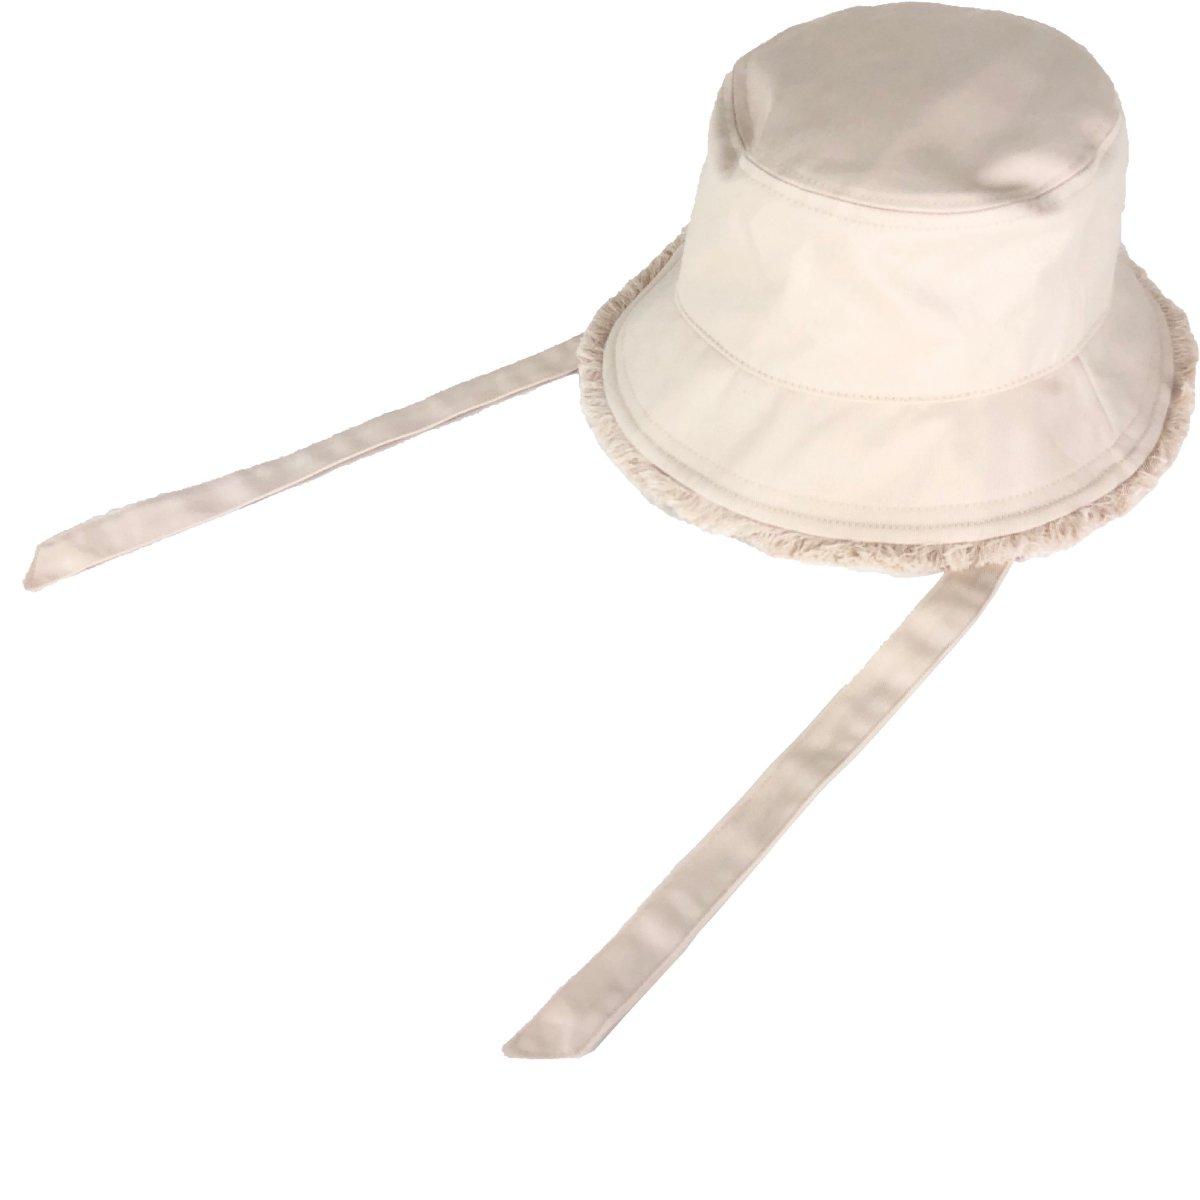 【KIDS】Kids Fringe Hat 詳細画像2